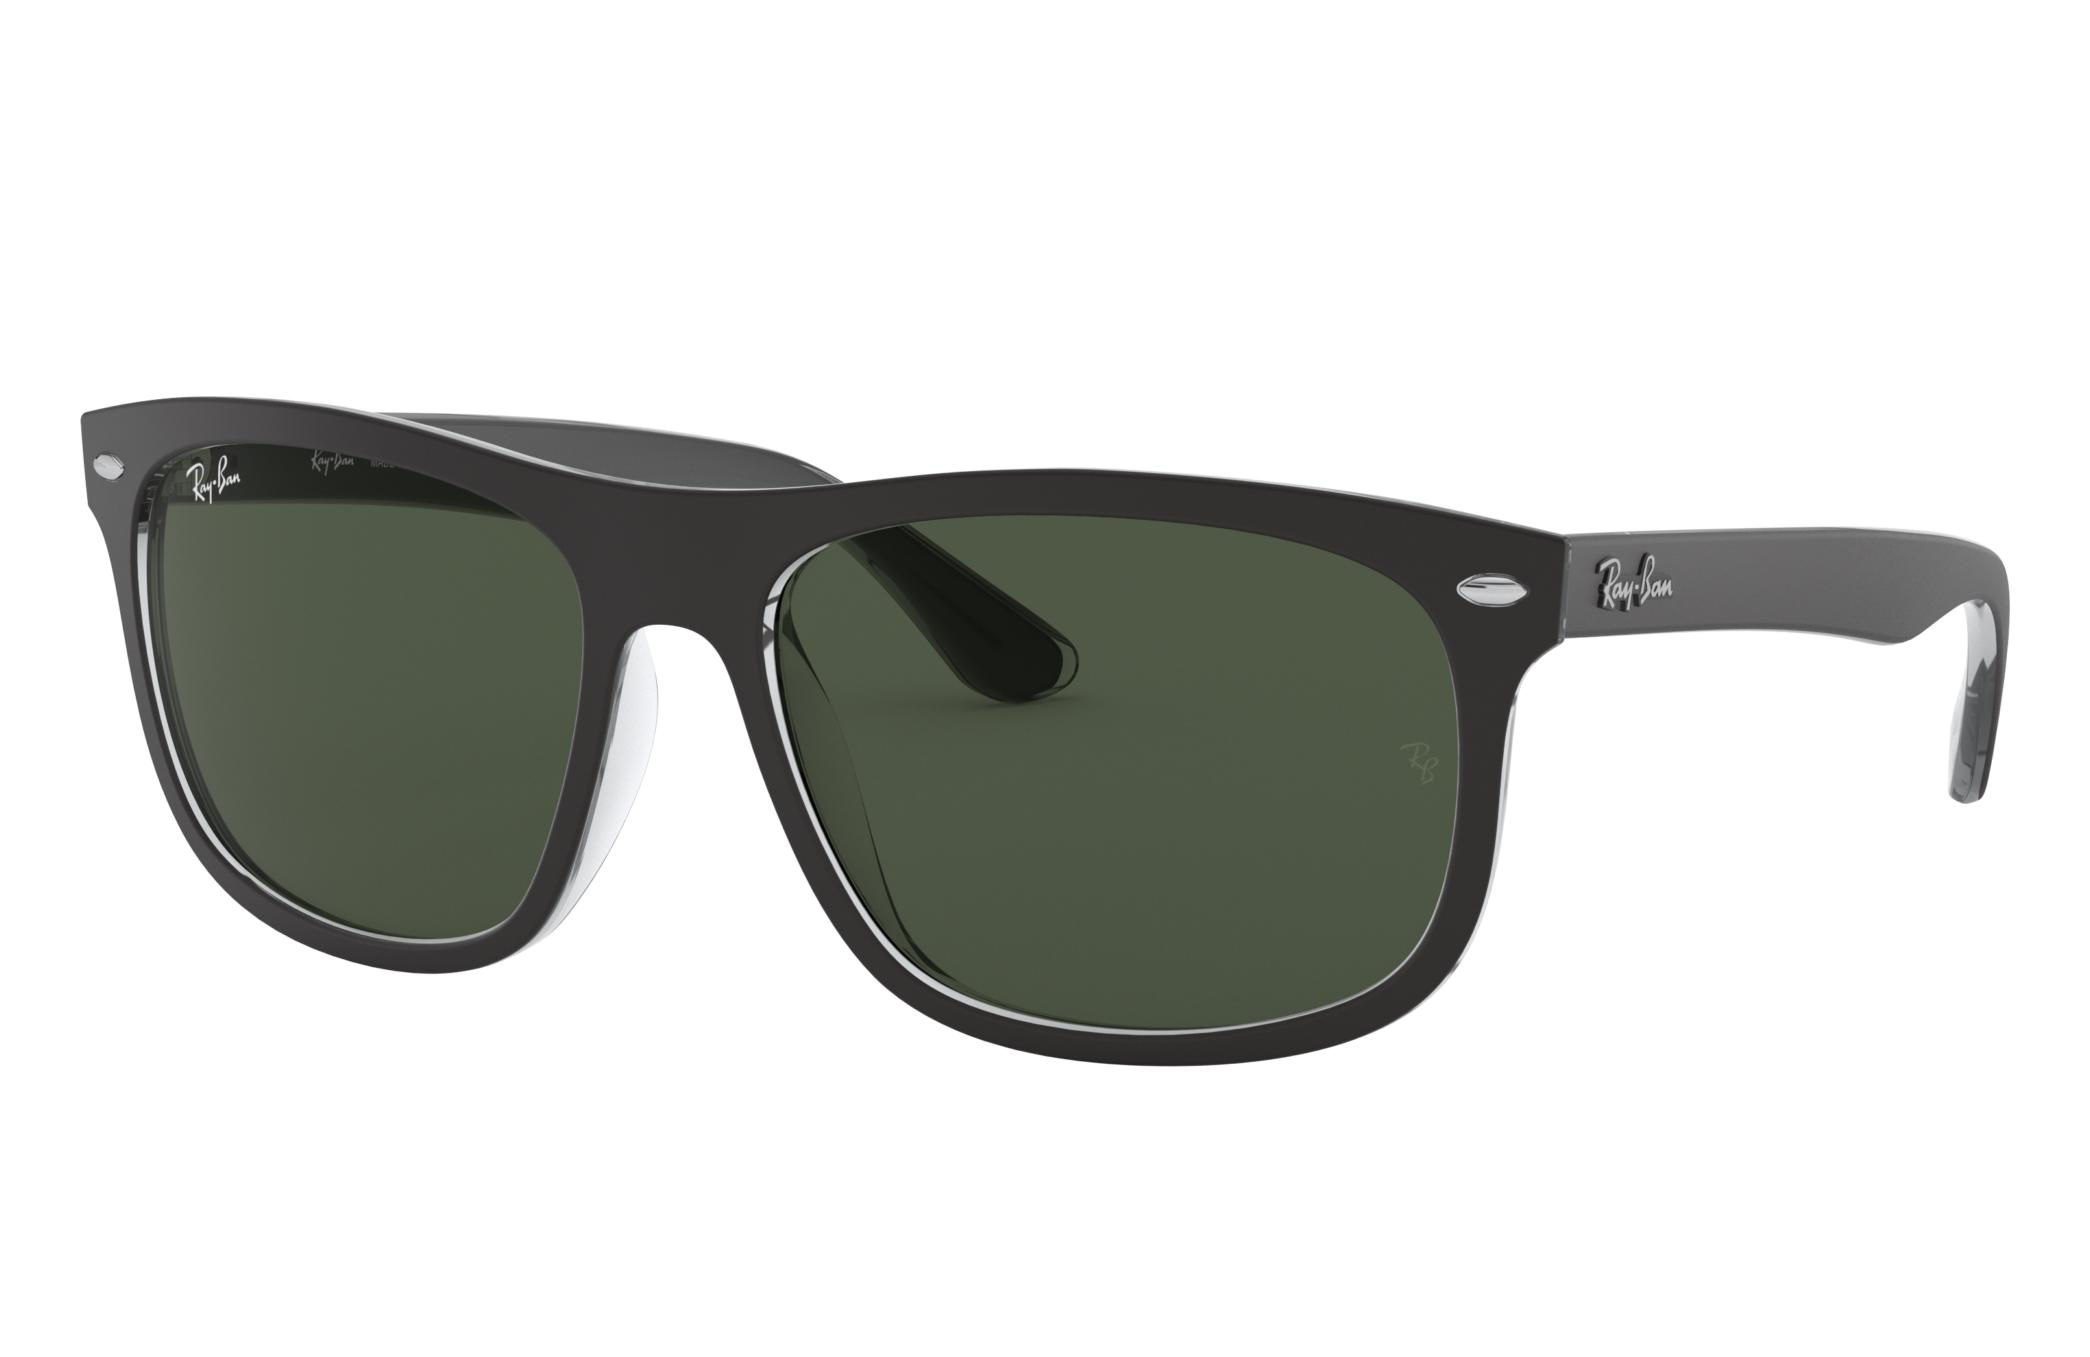 Ray-Ban Rb4226 Black, Green Lenses - RB4226